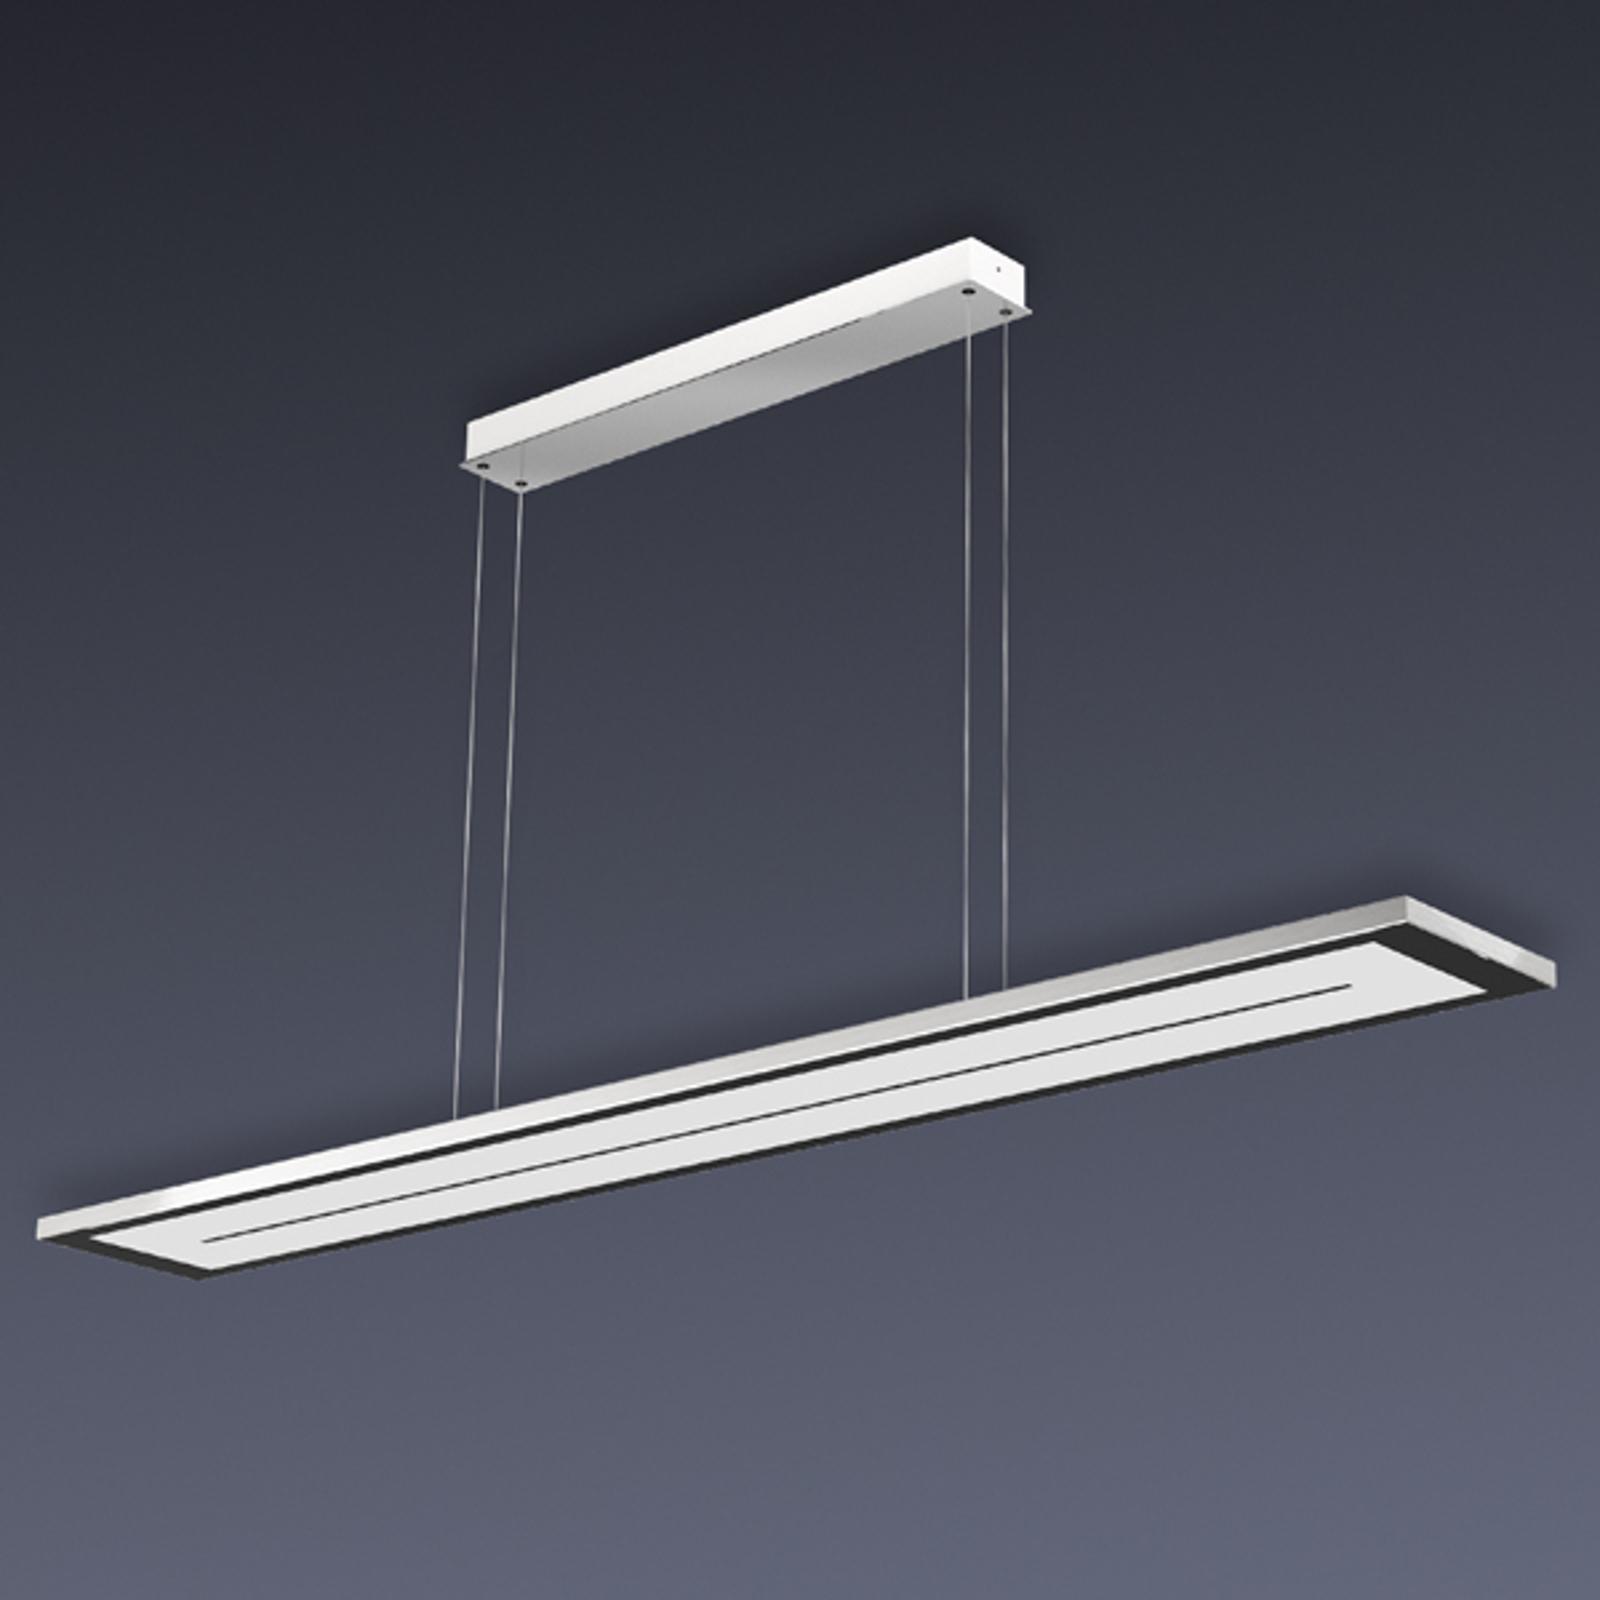 Dimbar LED-taklampa Zen - 108 cm lång